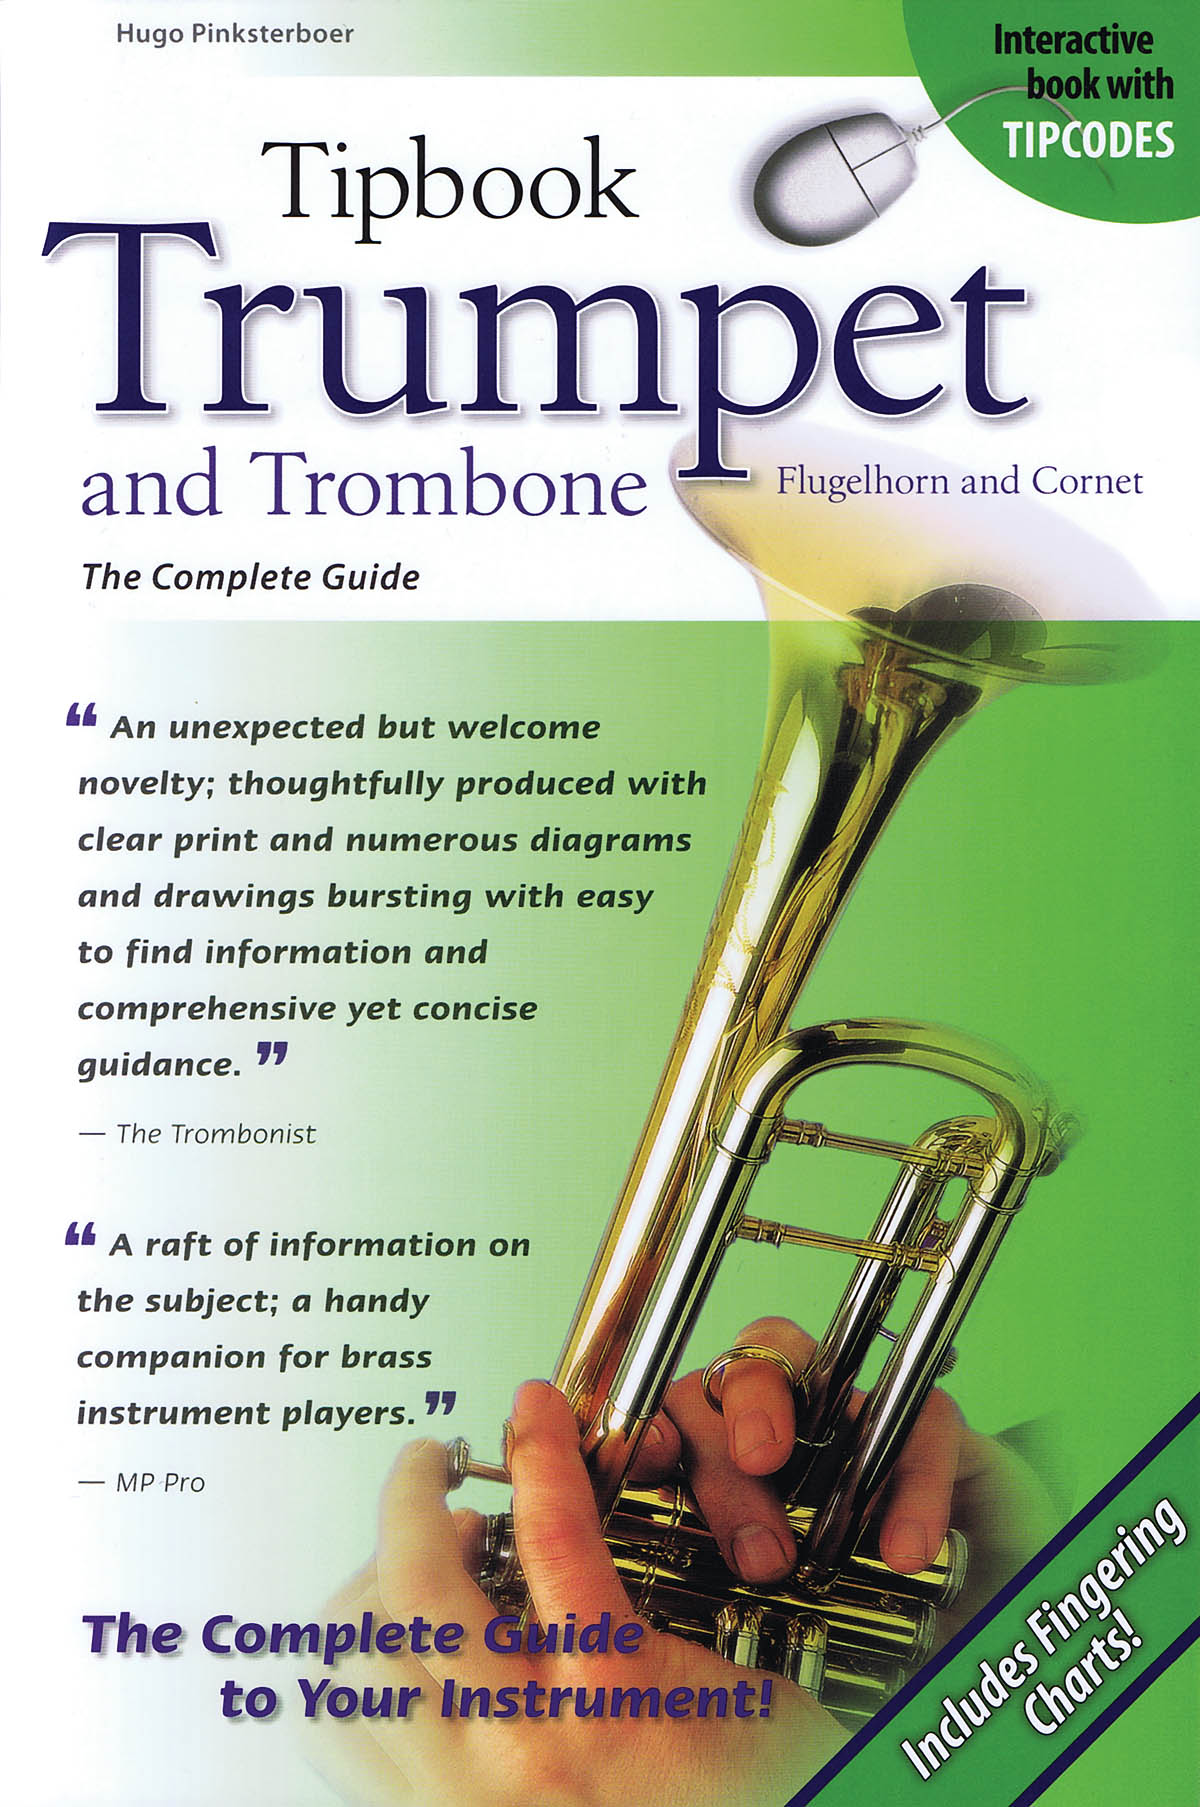 Trumpet And Trombone  Flugelhorn And Cornet: Reference Books